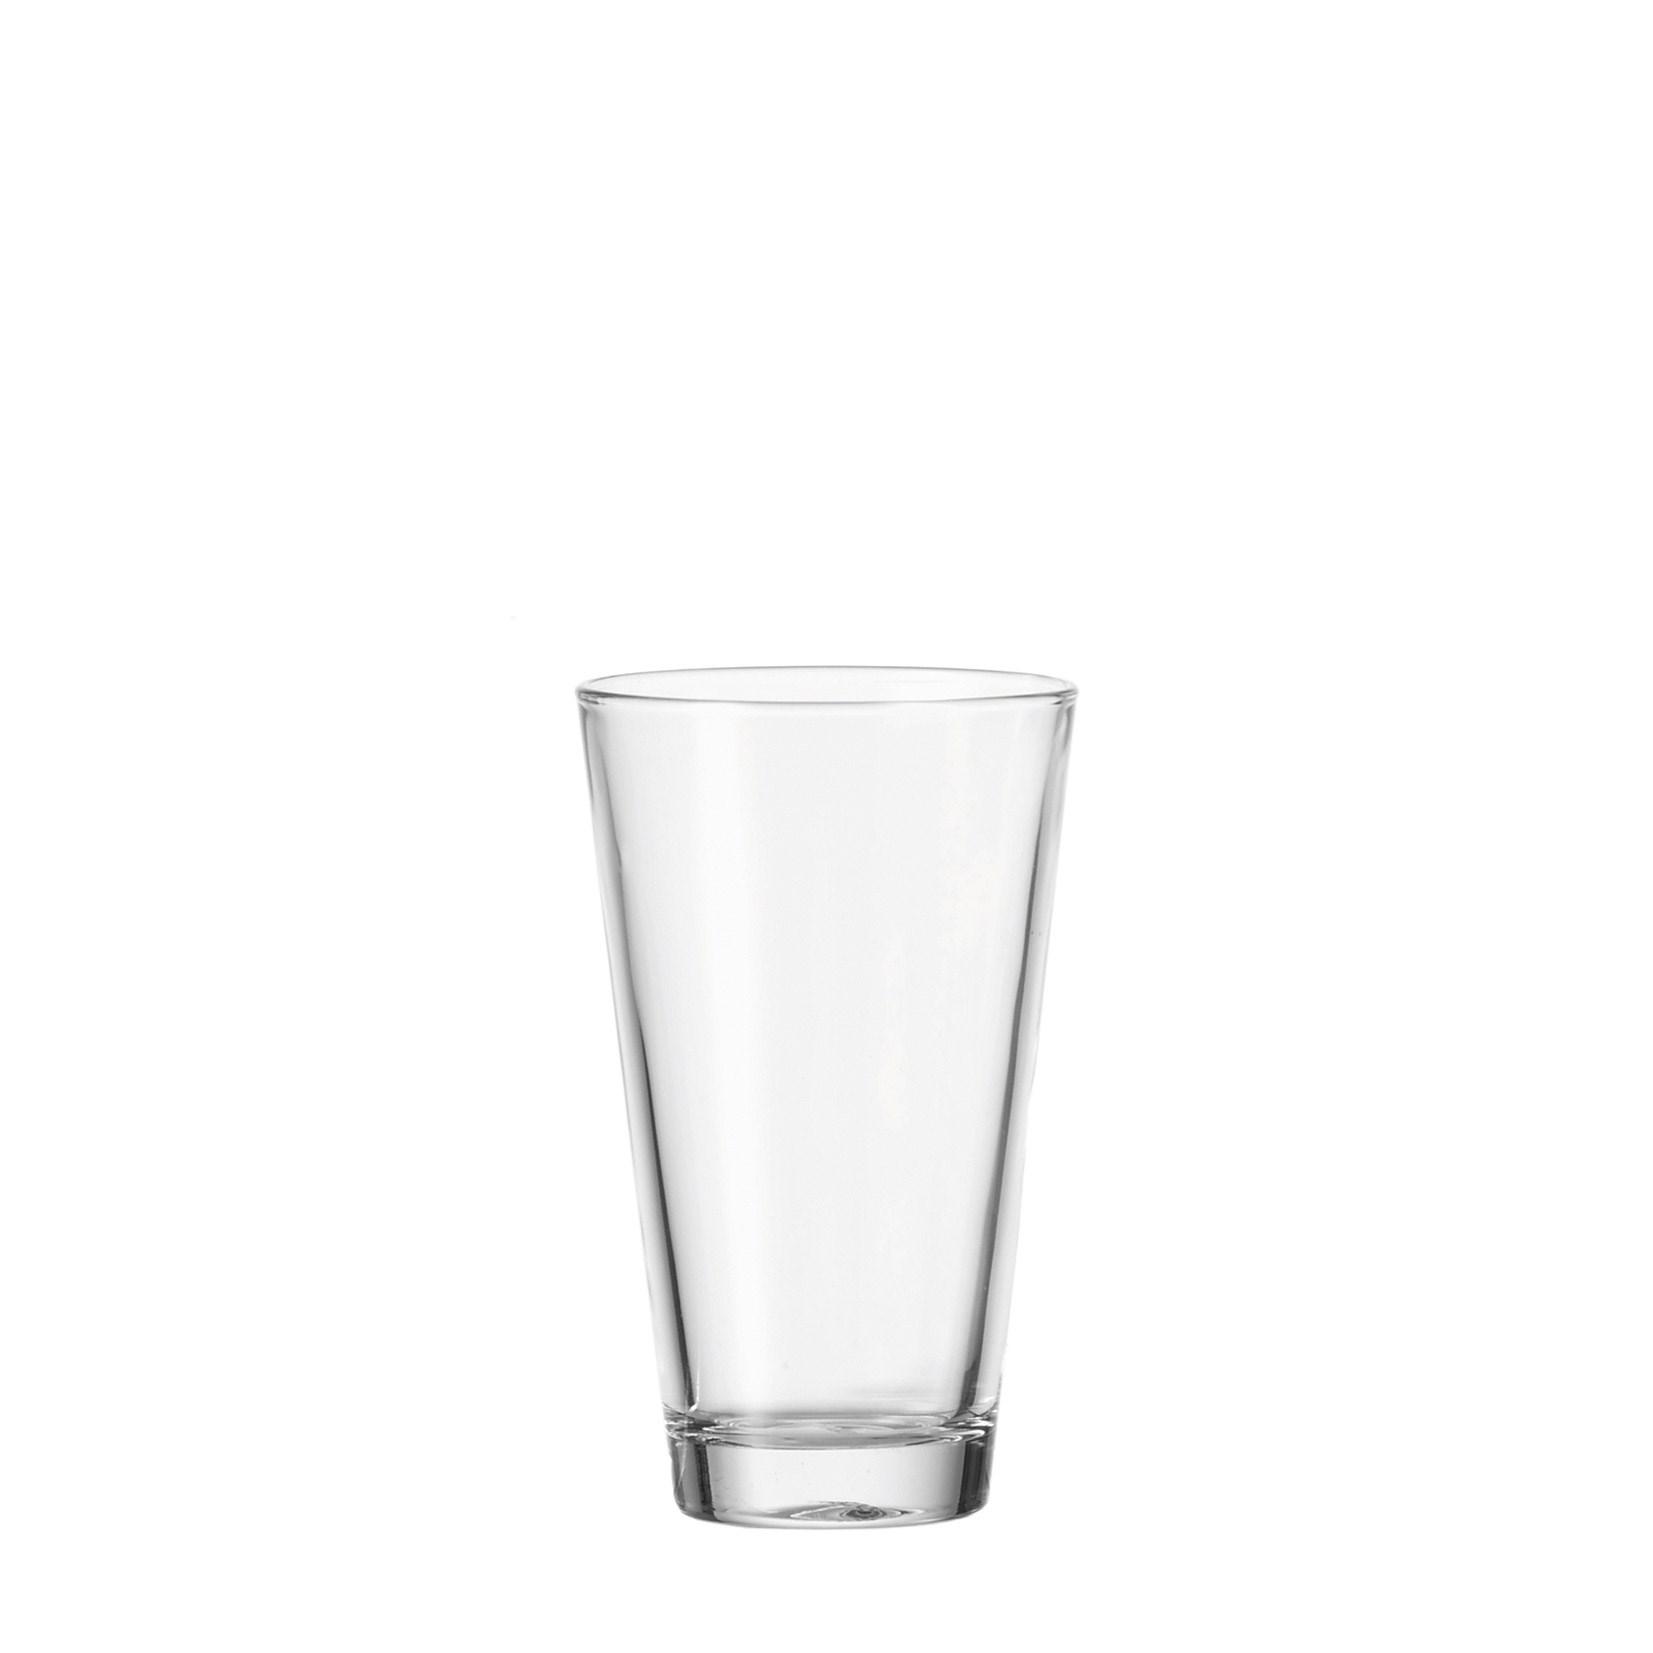 Sklenice na vodu Ciao 300 ml_6